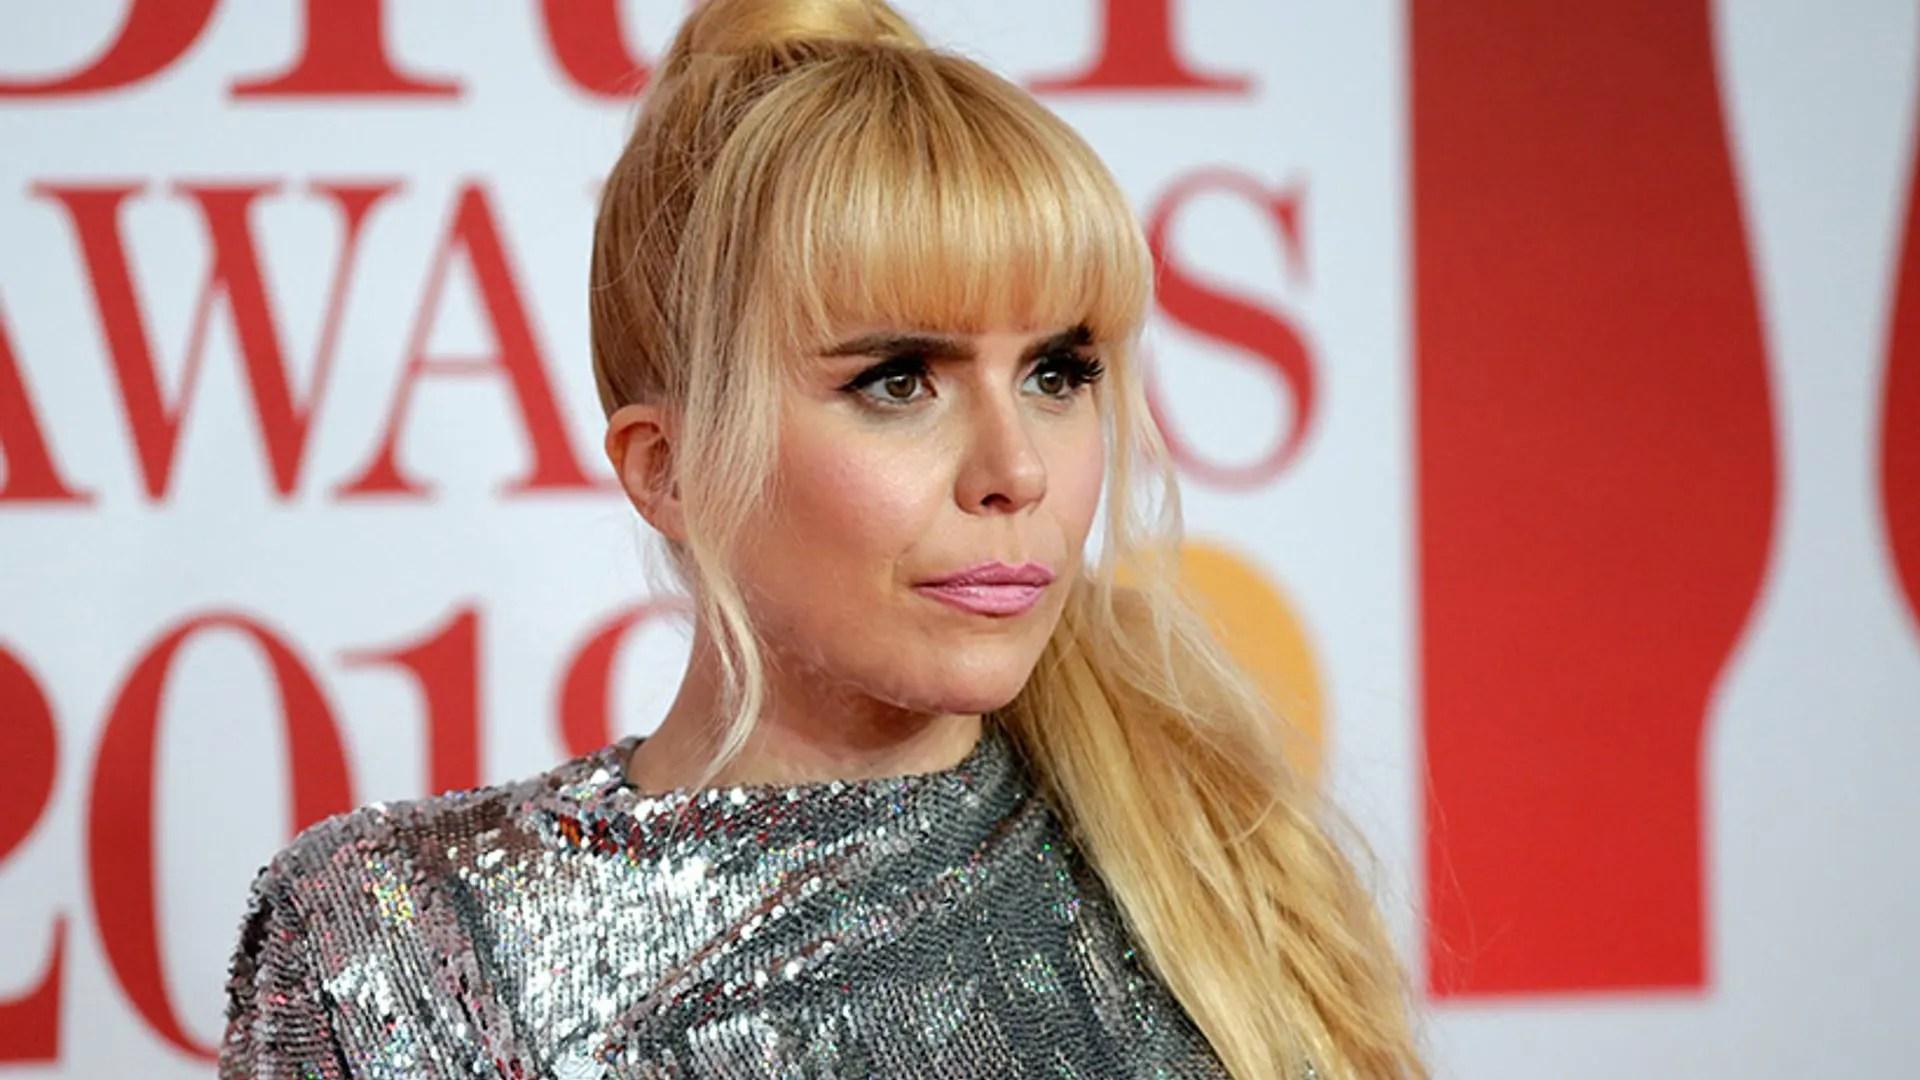 Paloma Faiths New Blonde Hair Transformation Is So